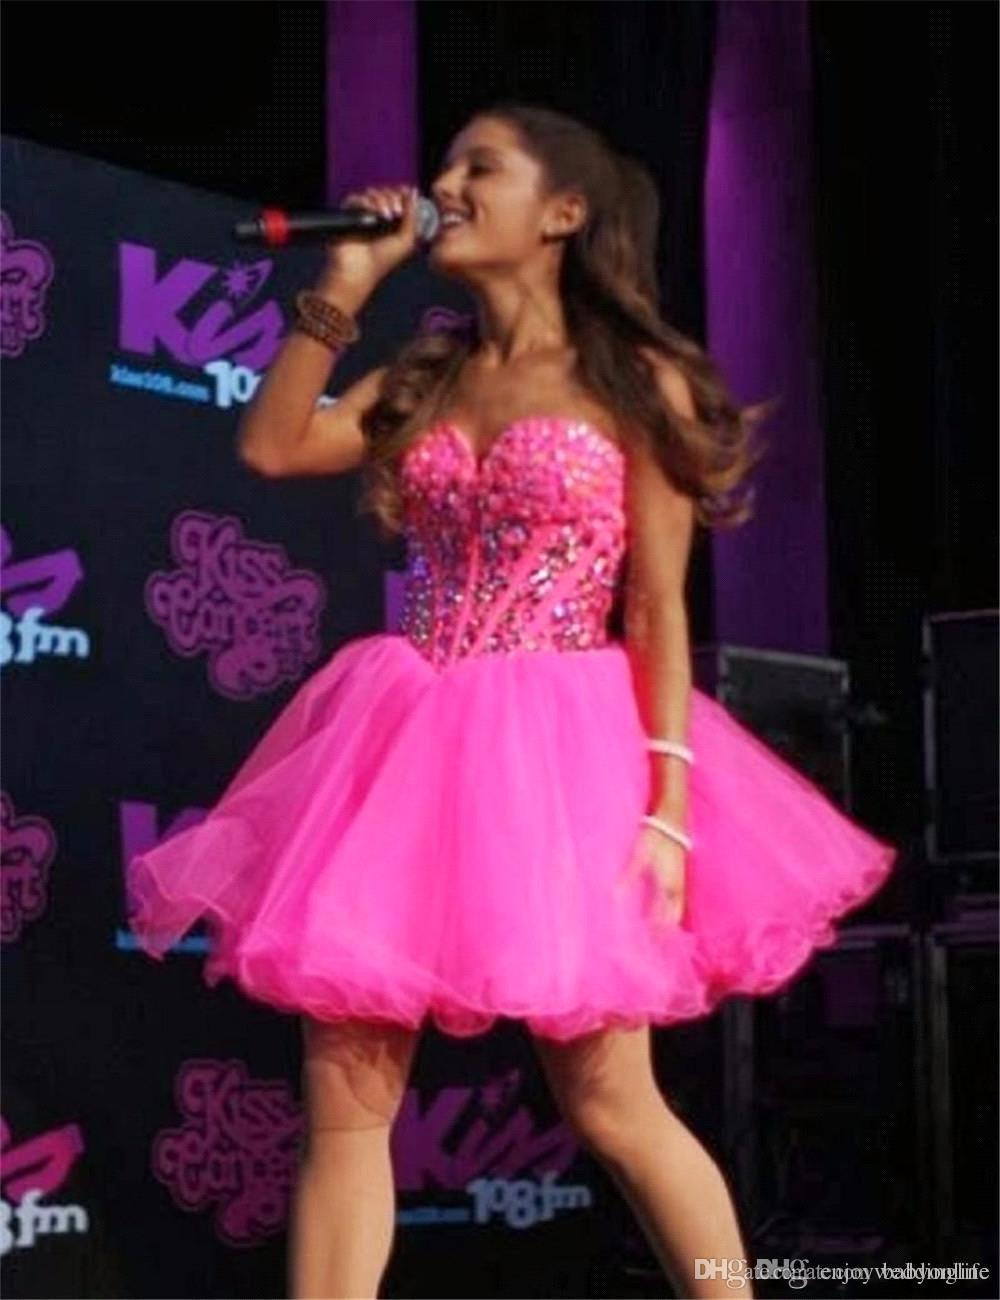 Hot Pink Mini Short Sweetheart Abiti Homecoming Perline Strass Backless Vita basca Dolce 16 Breve Prom Abiti da cocktail BA6693